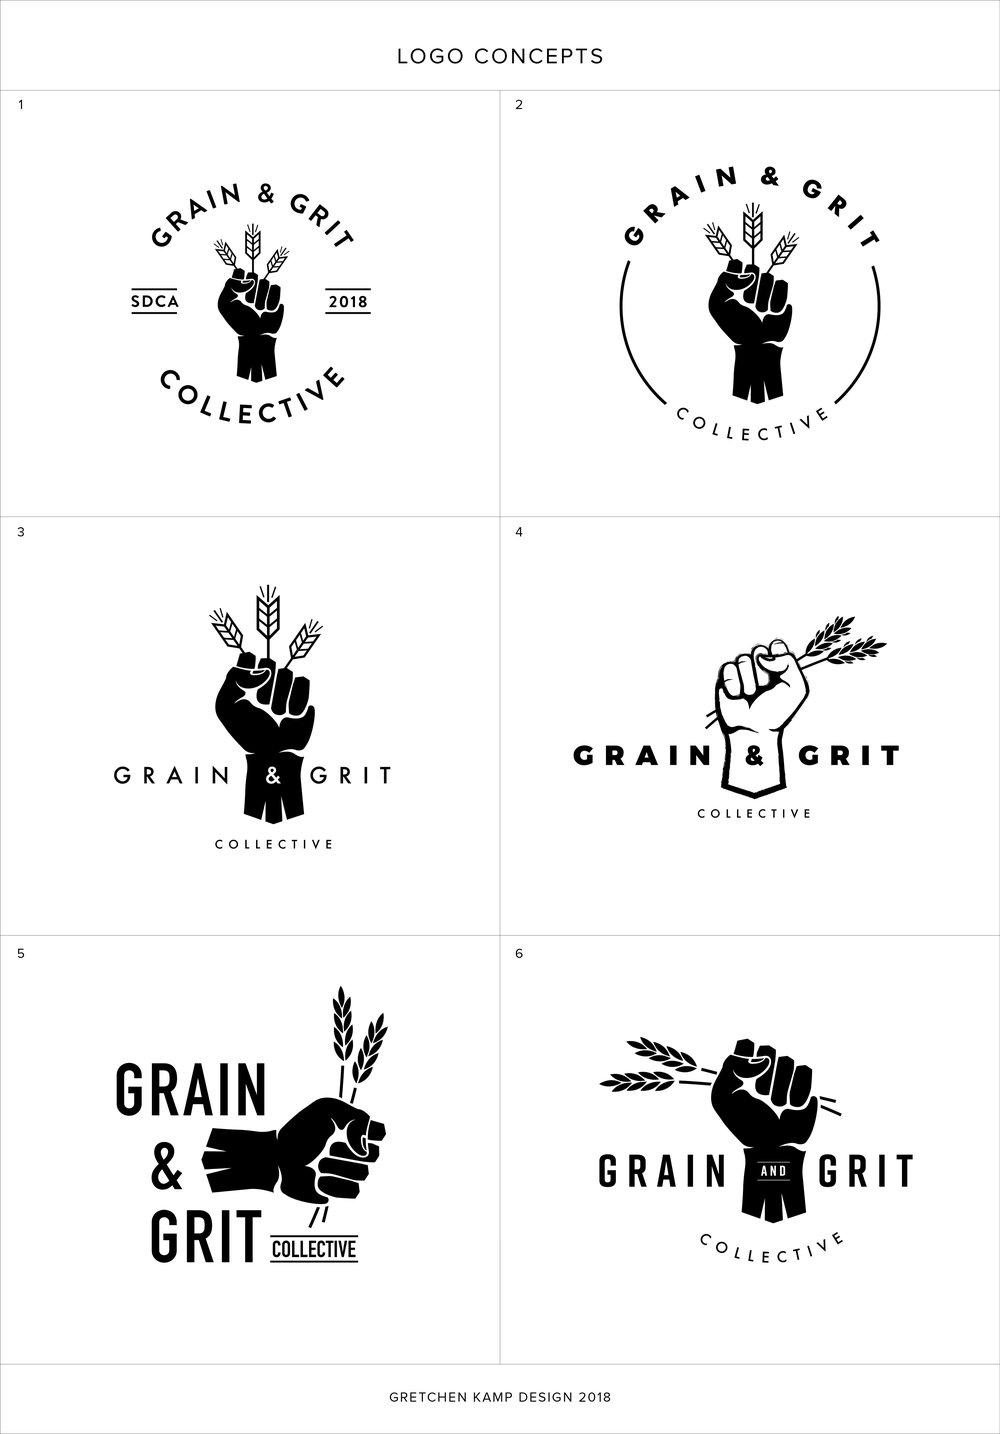 G&G_logos_round1.jpg